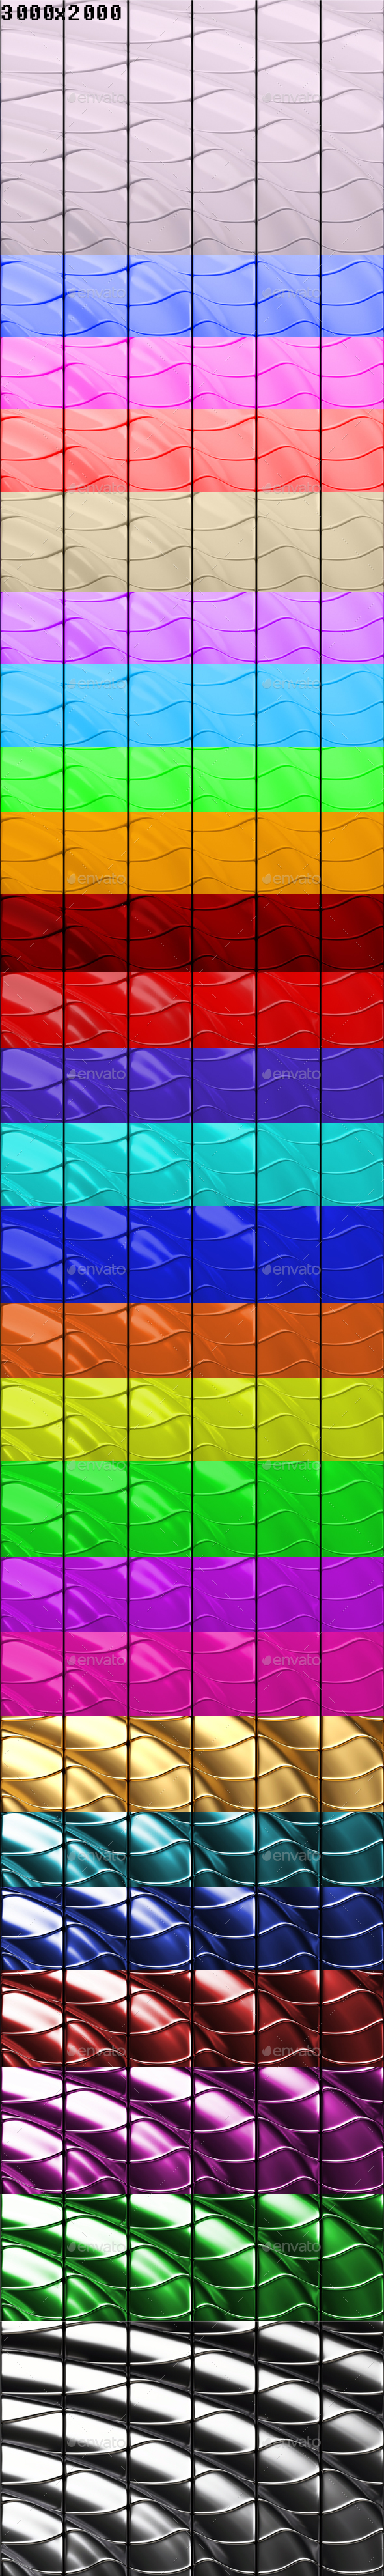 Geometric Waves Wallpapers